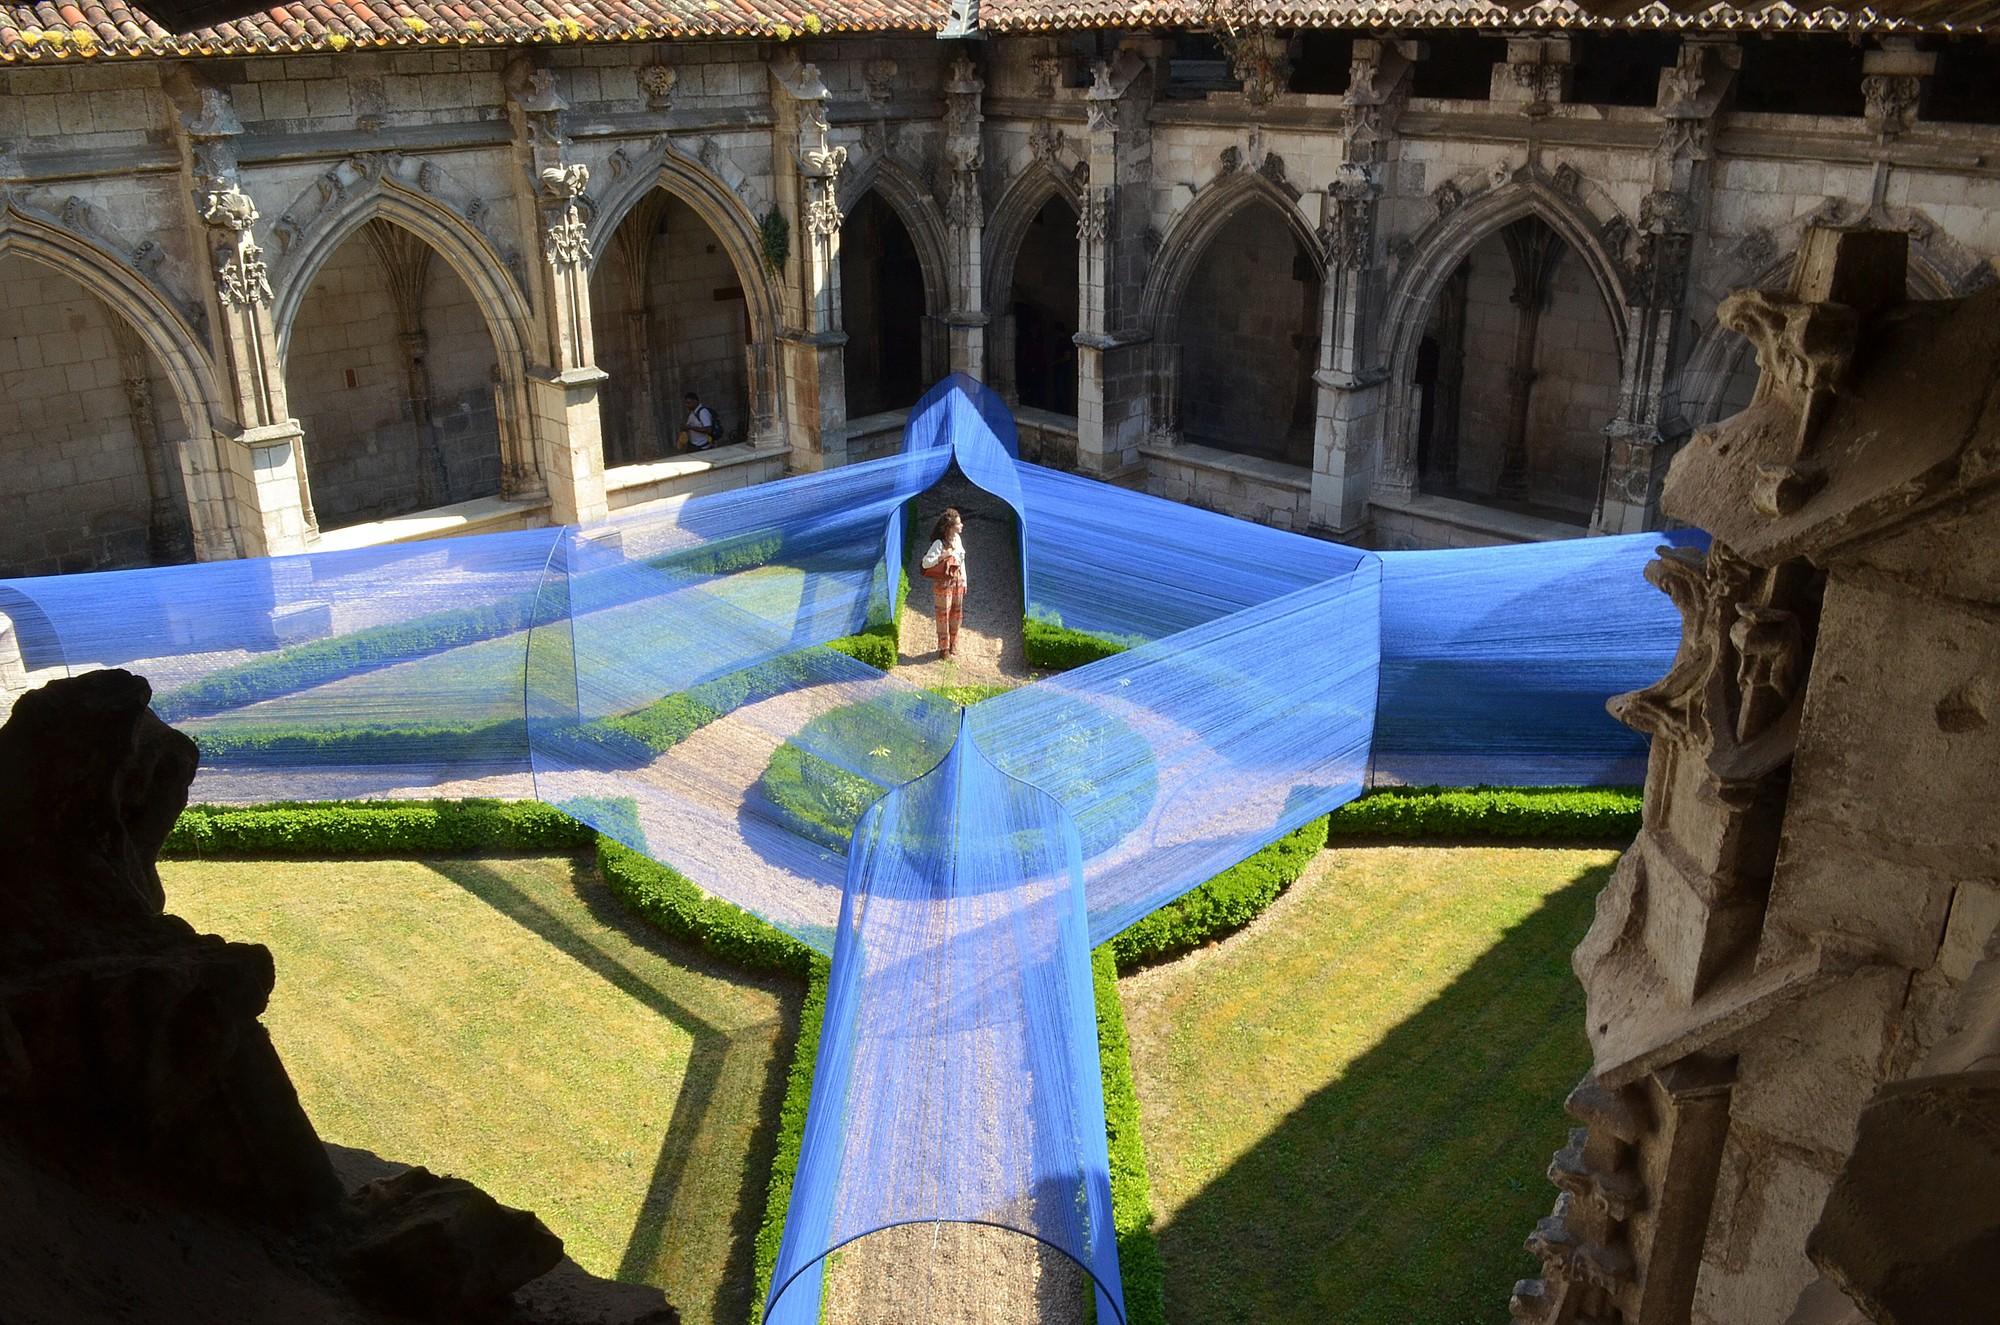 Installation in Courtyard. Image Courtesy of Atelier YokYok + Ulysse Lacoste